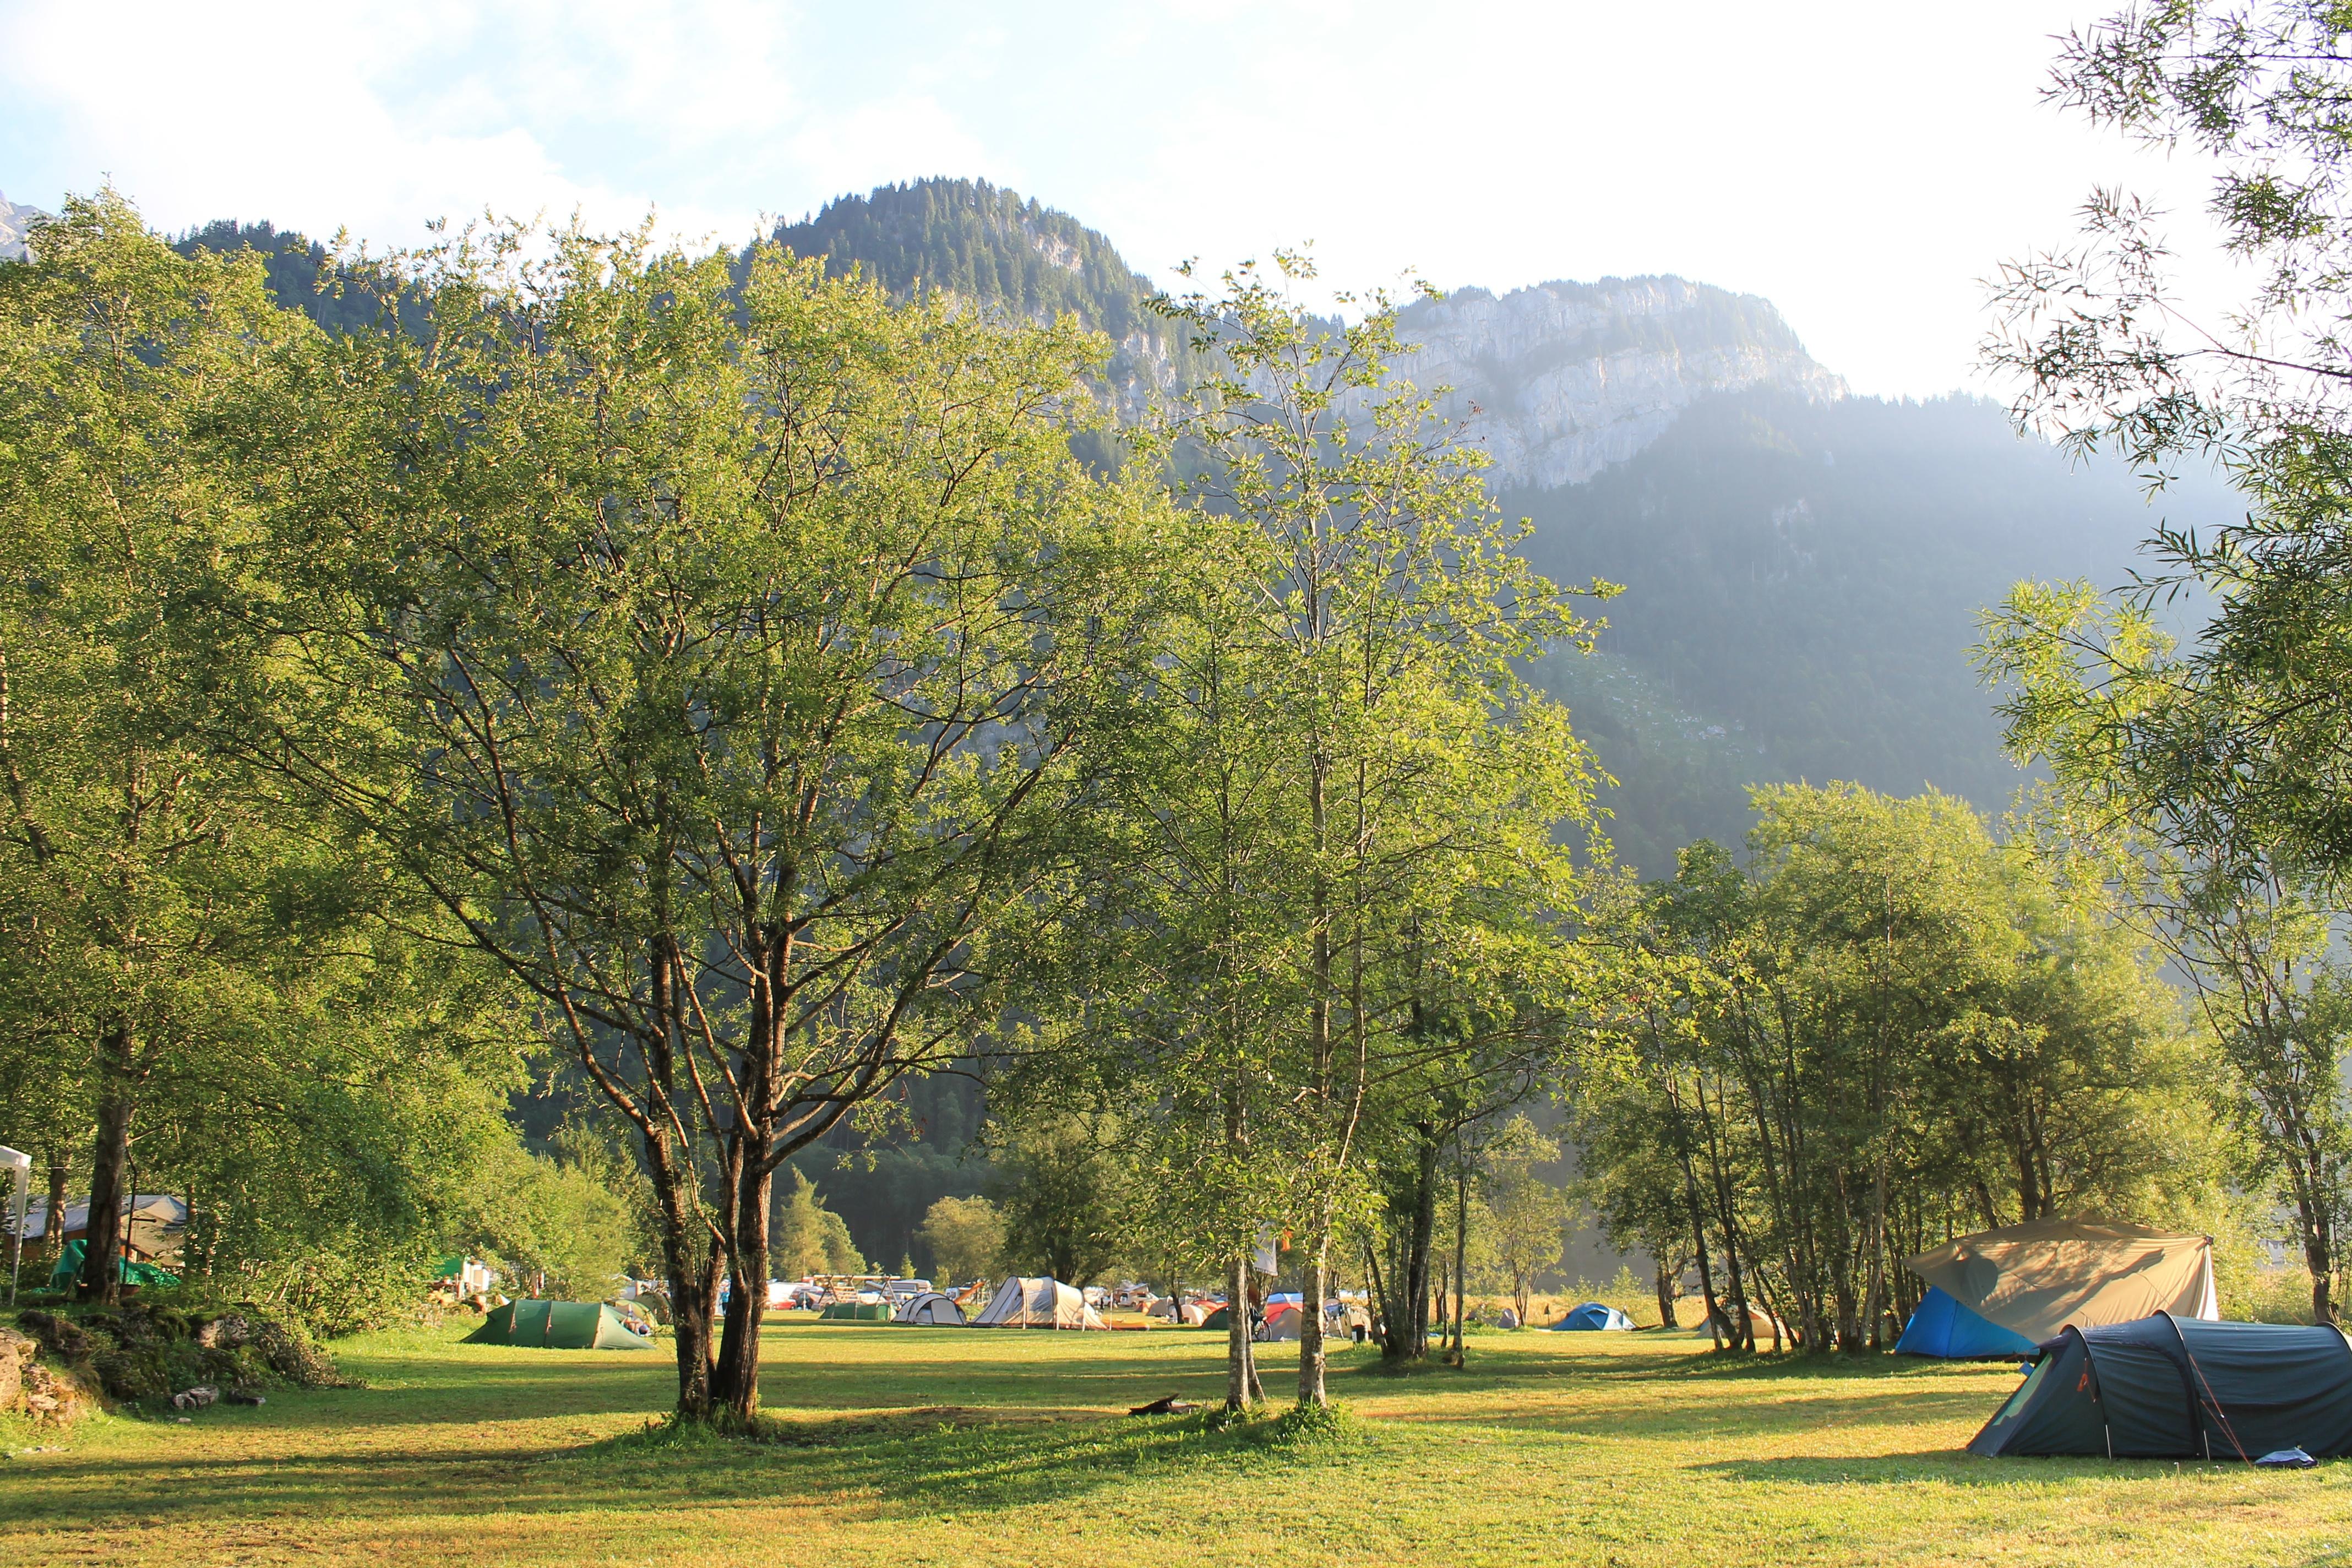 Fileklöntalersee Camping Vorauen 9691777653jpg Wikimedia Commons